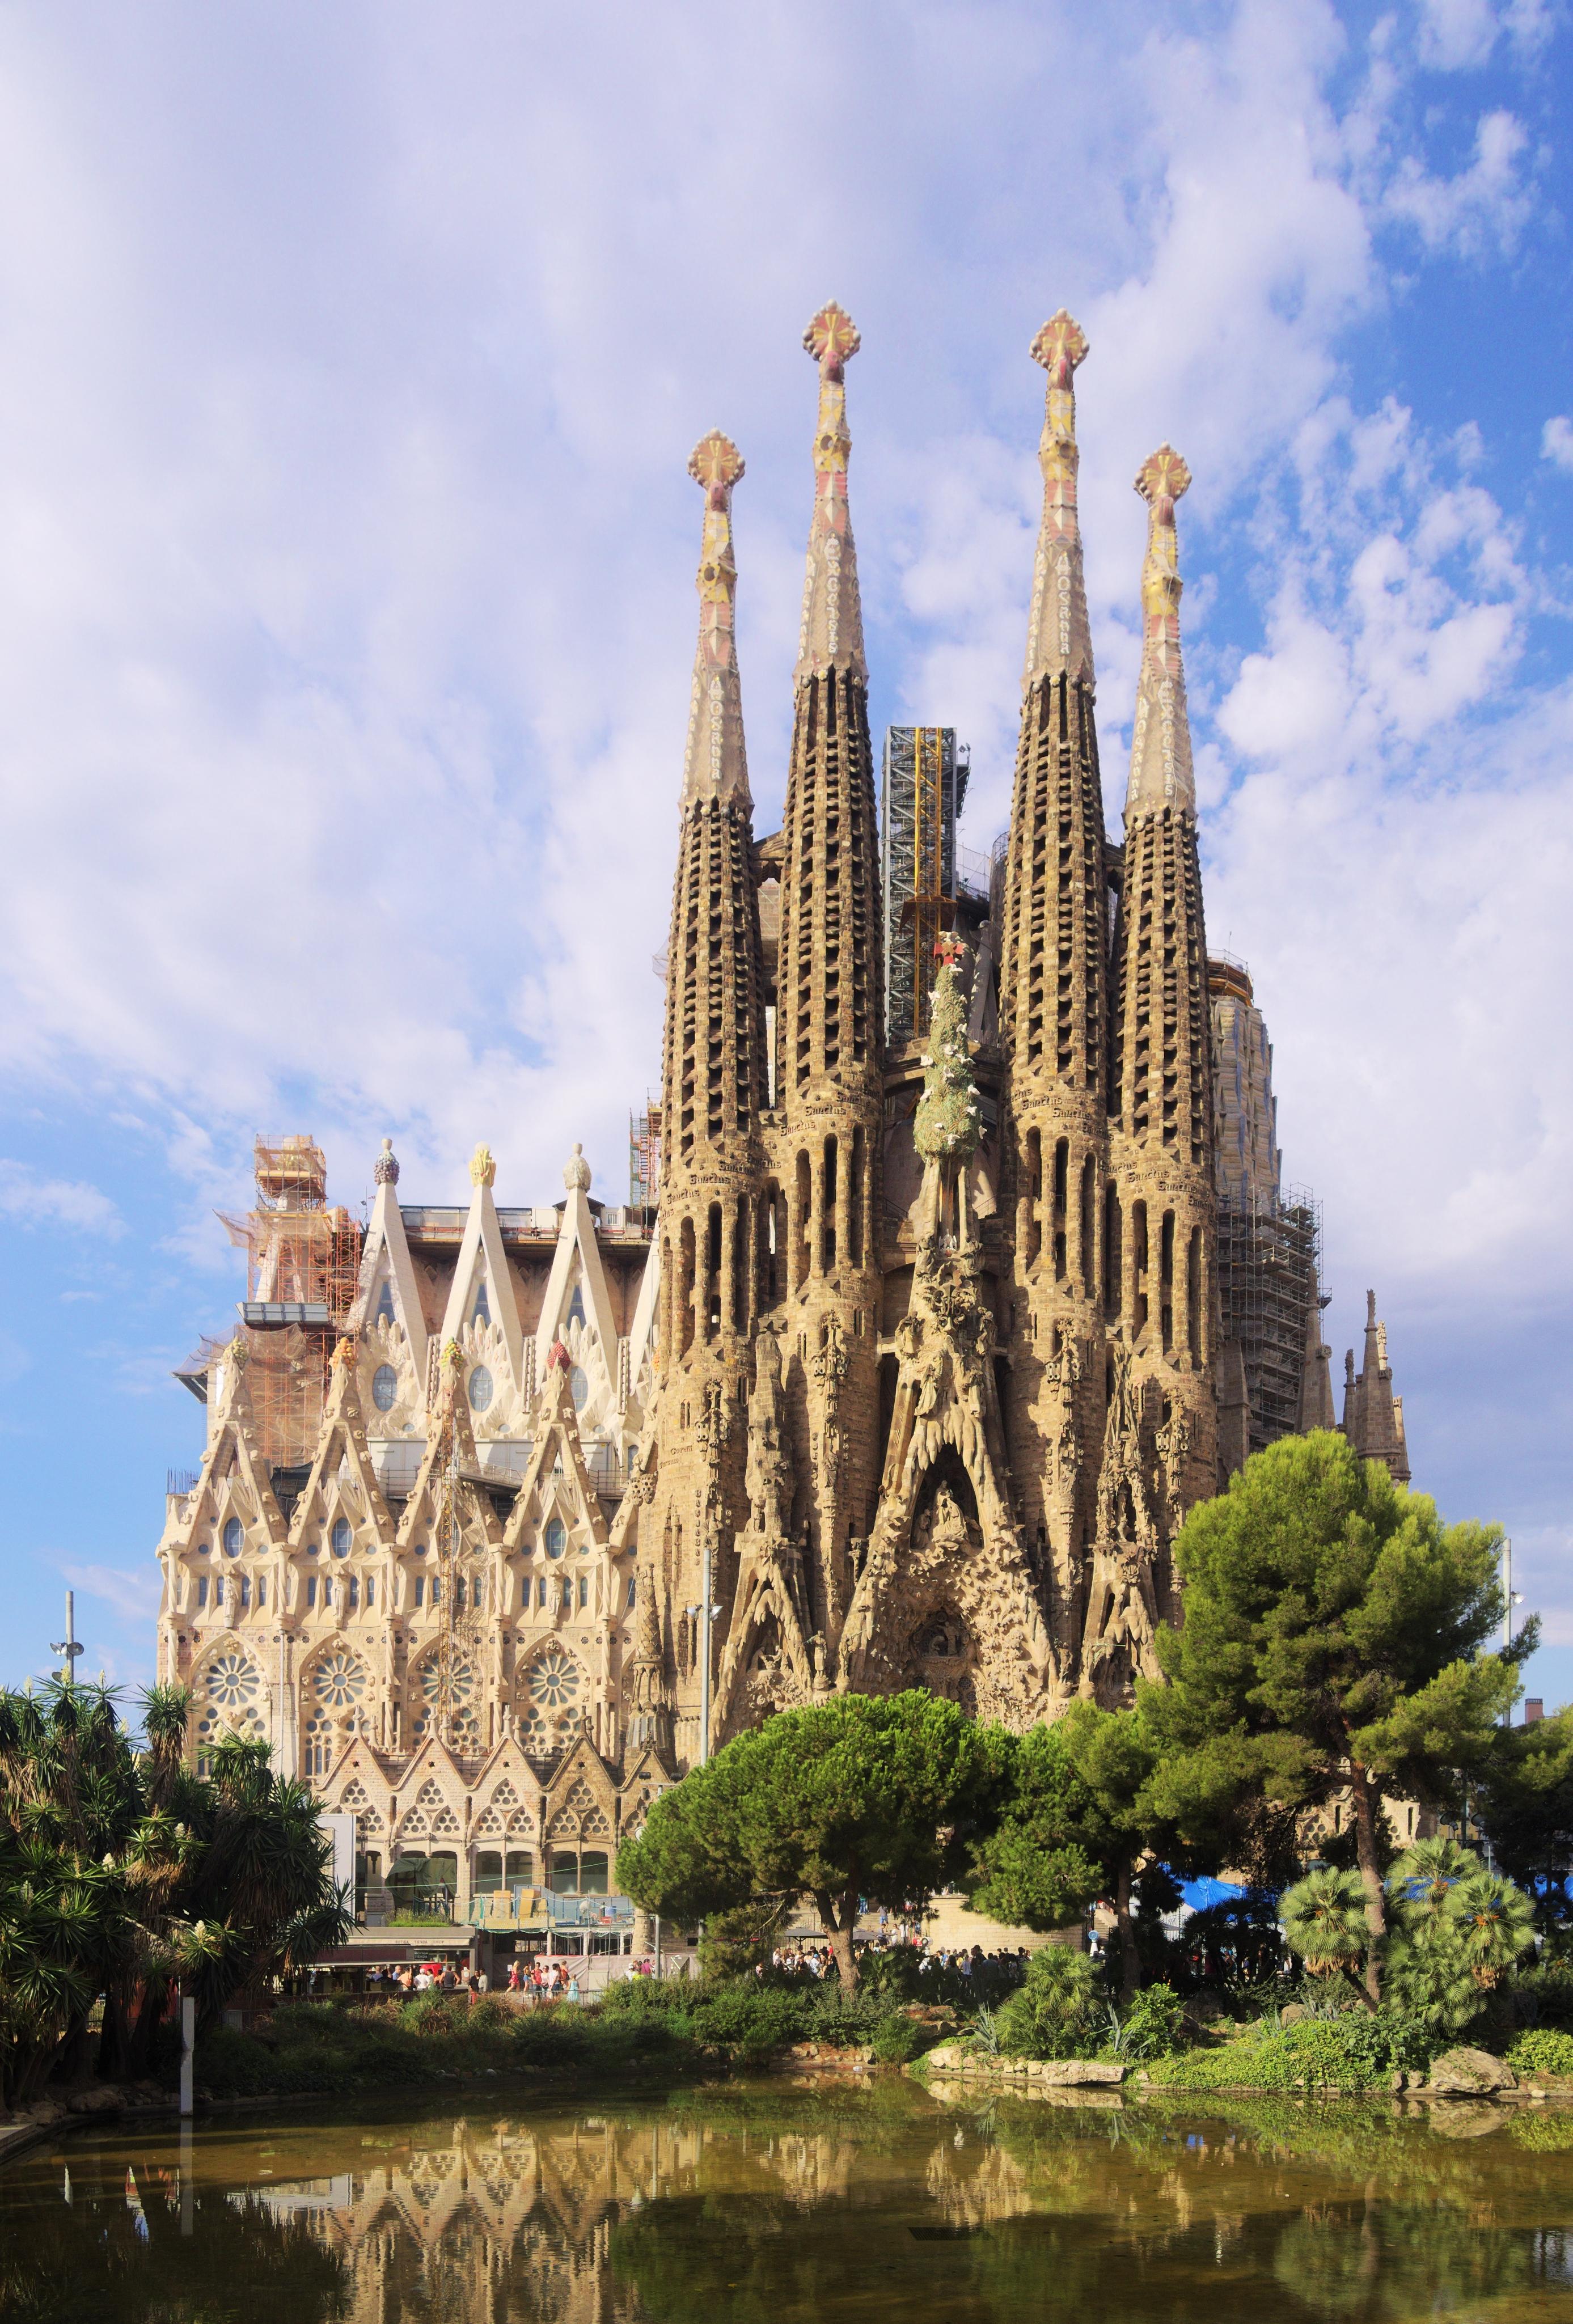 Sagrada Familia: Free Photo: La Sagrada Familia